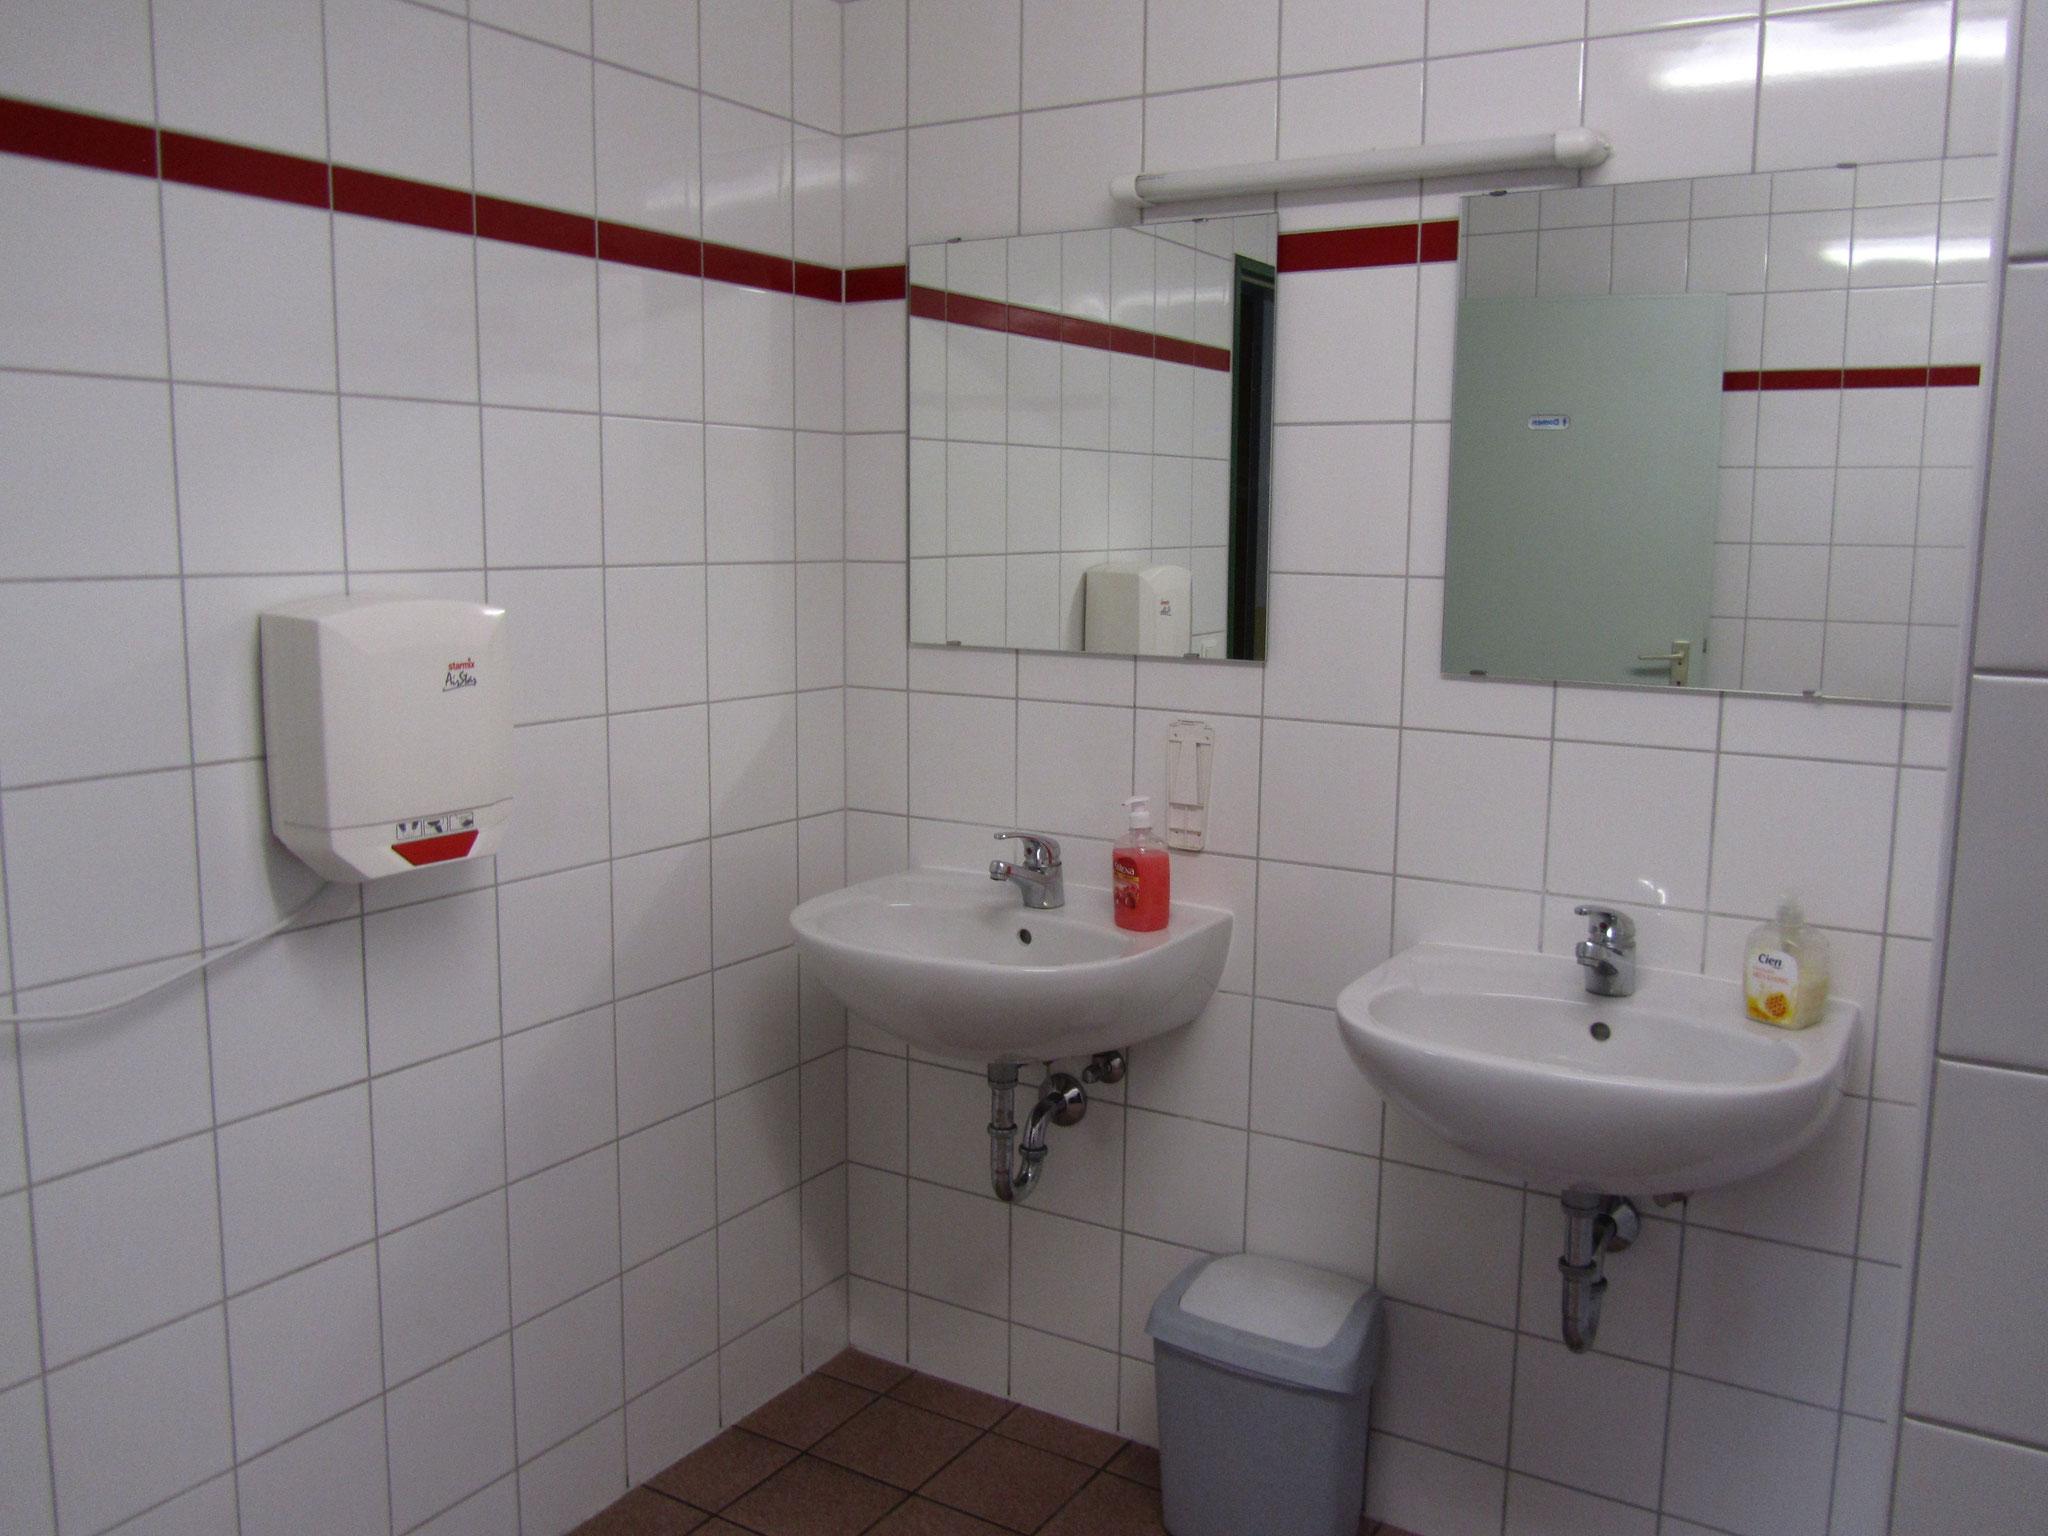 Sanitäre Anlagen SV Lokomotive Hafen Potsdam